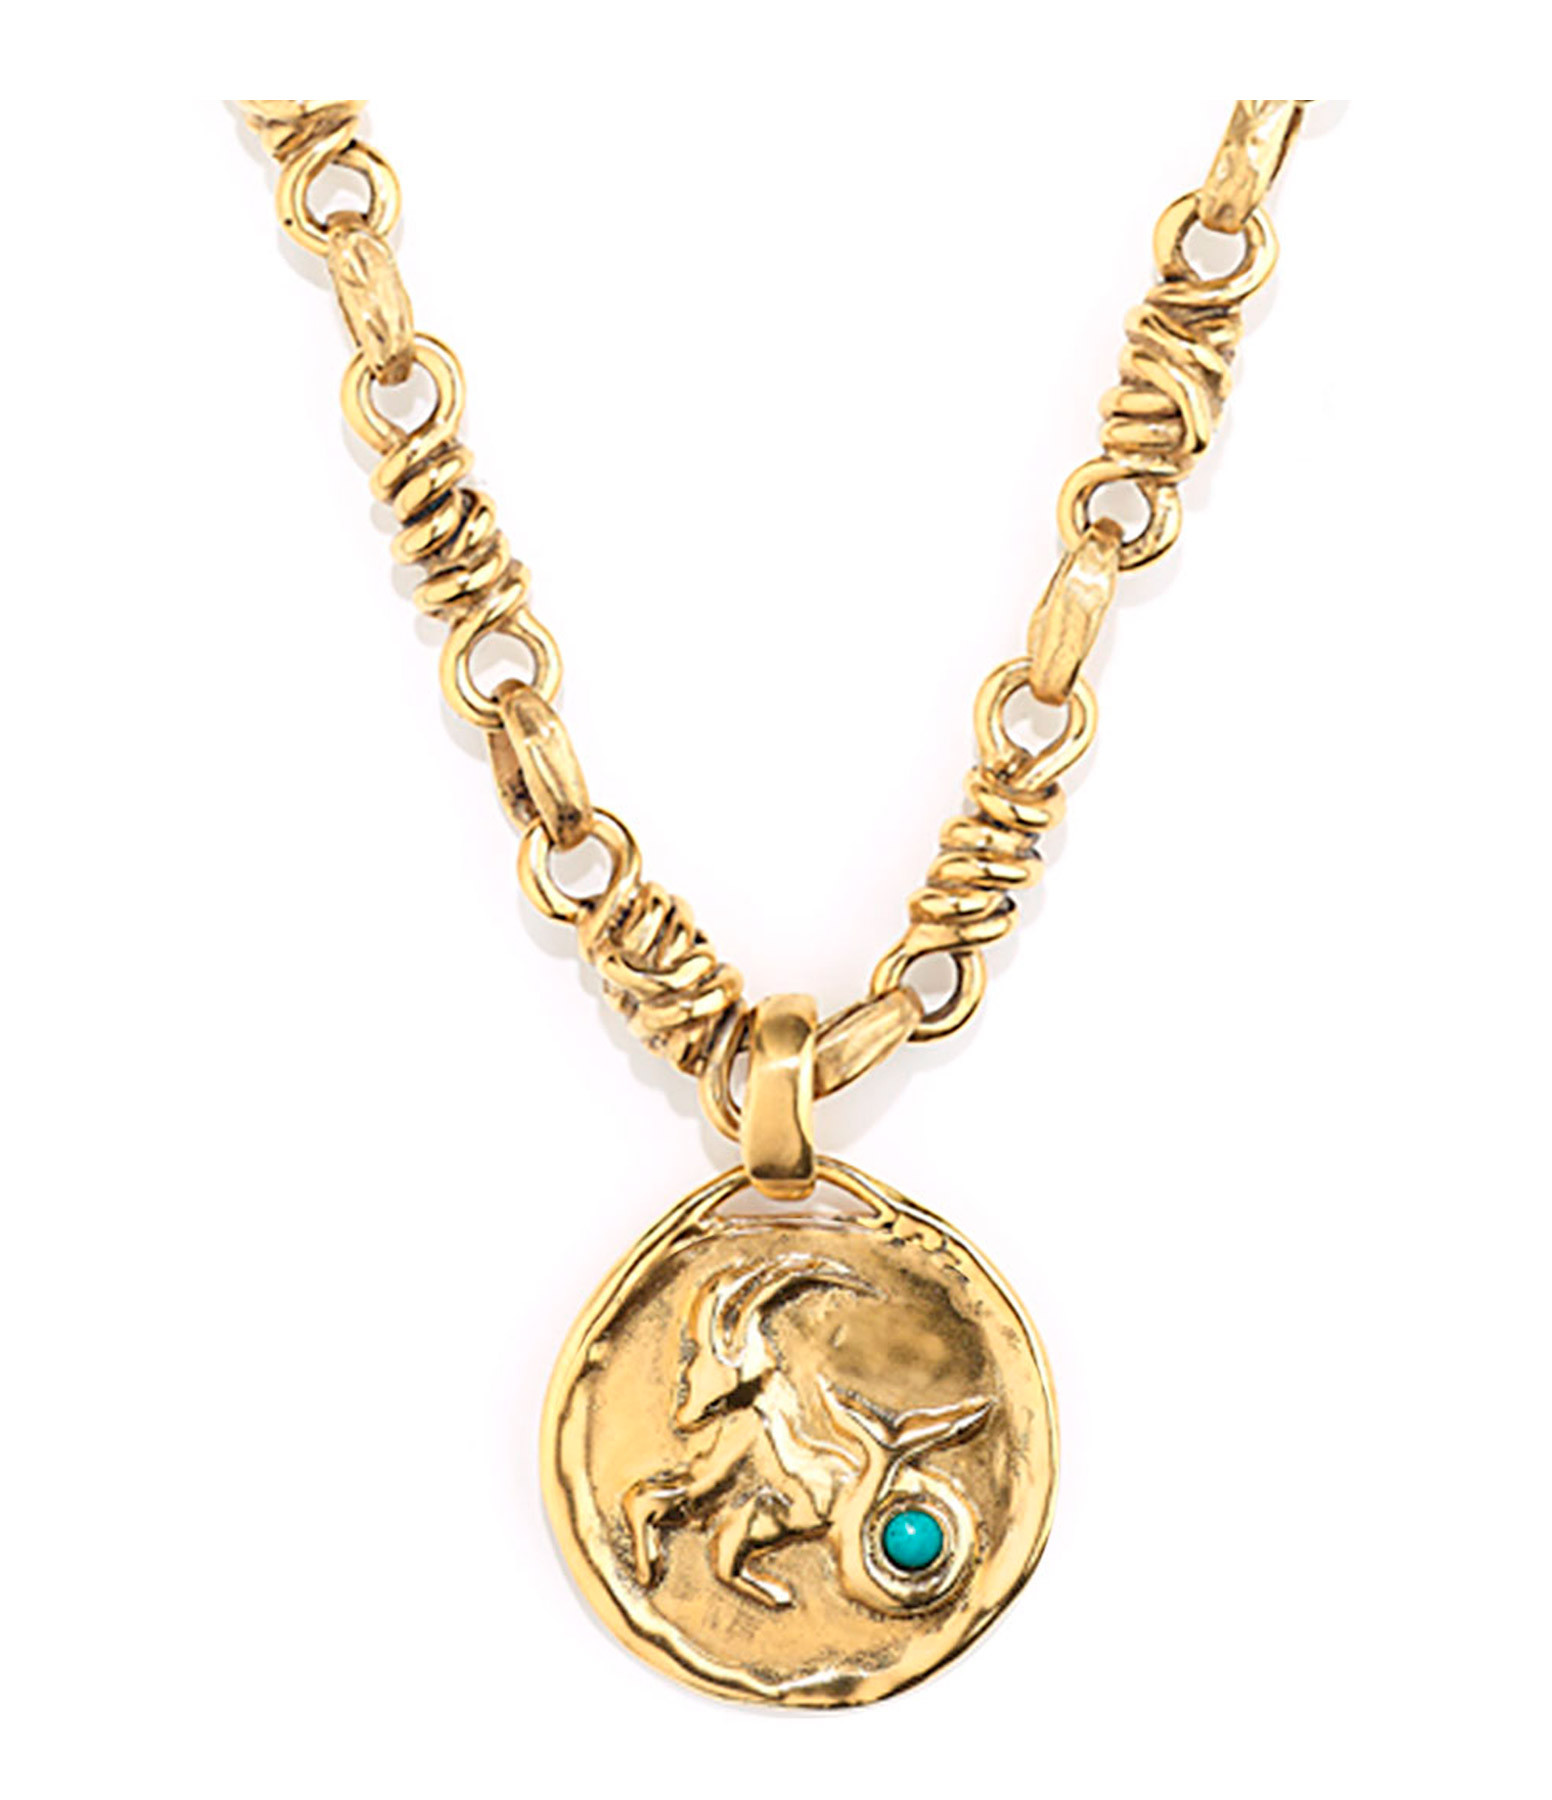 GOOSSENS - Collier Talisman Astro Capricorne Turquoise